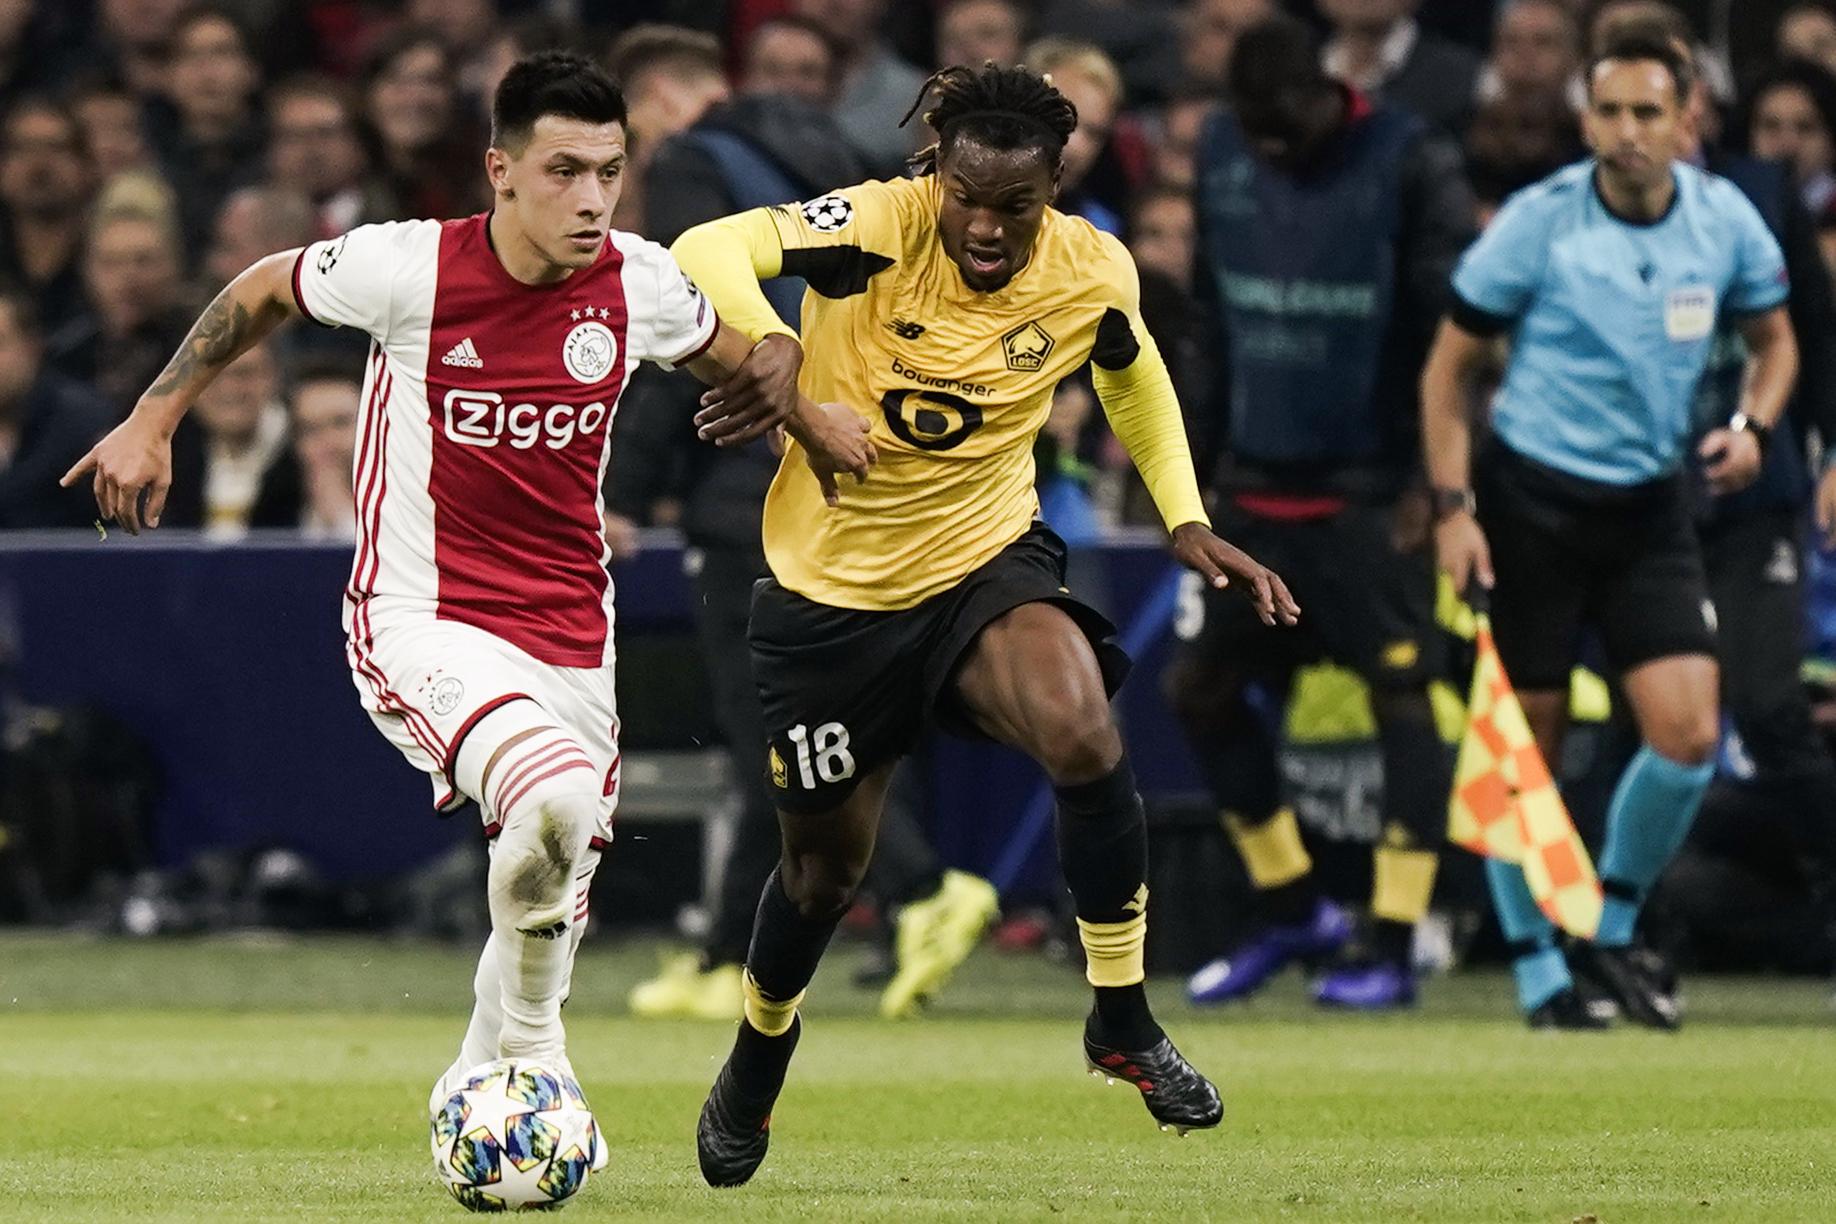 Tirage Ligue Europa Lille Ajax Amsterdam 2019-2020